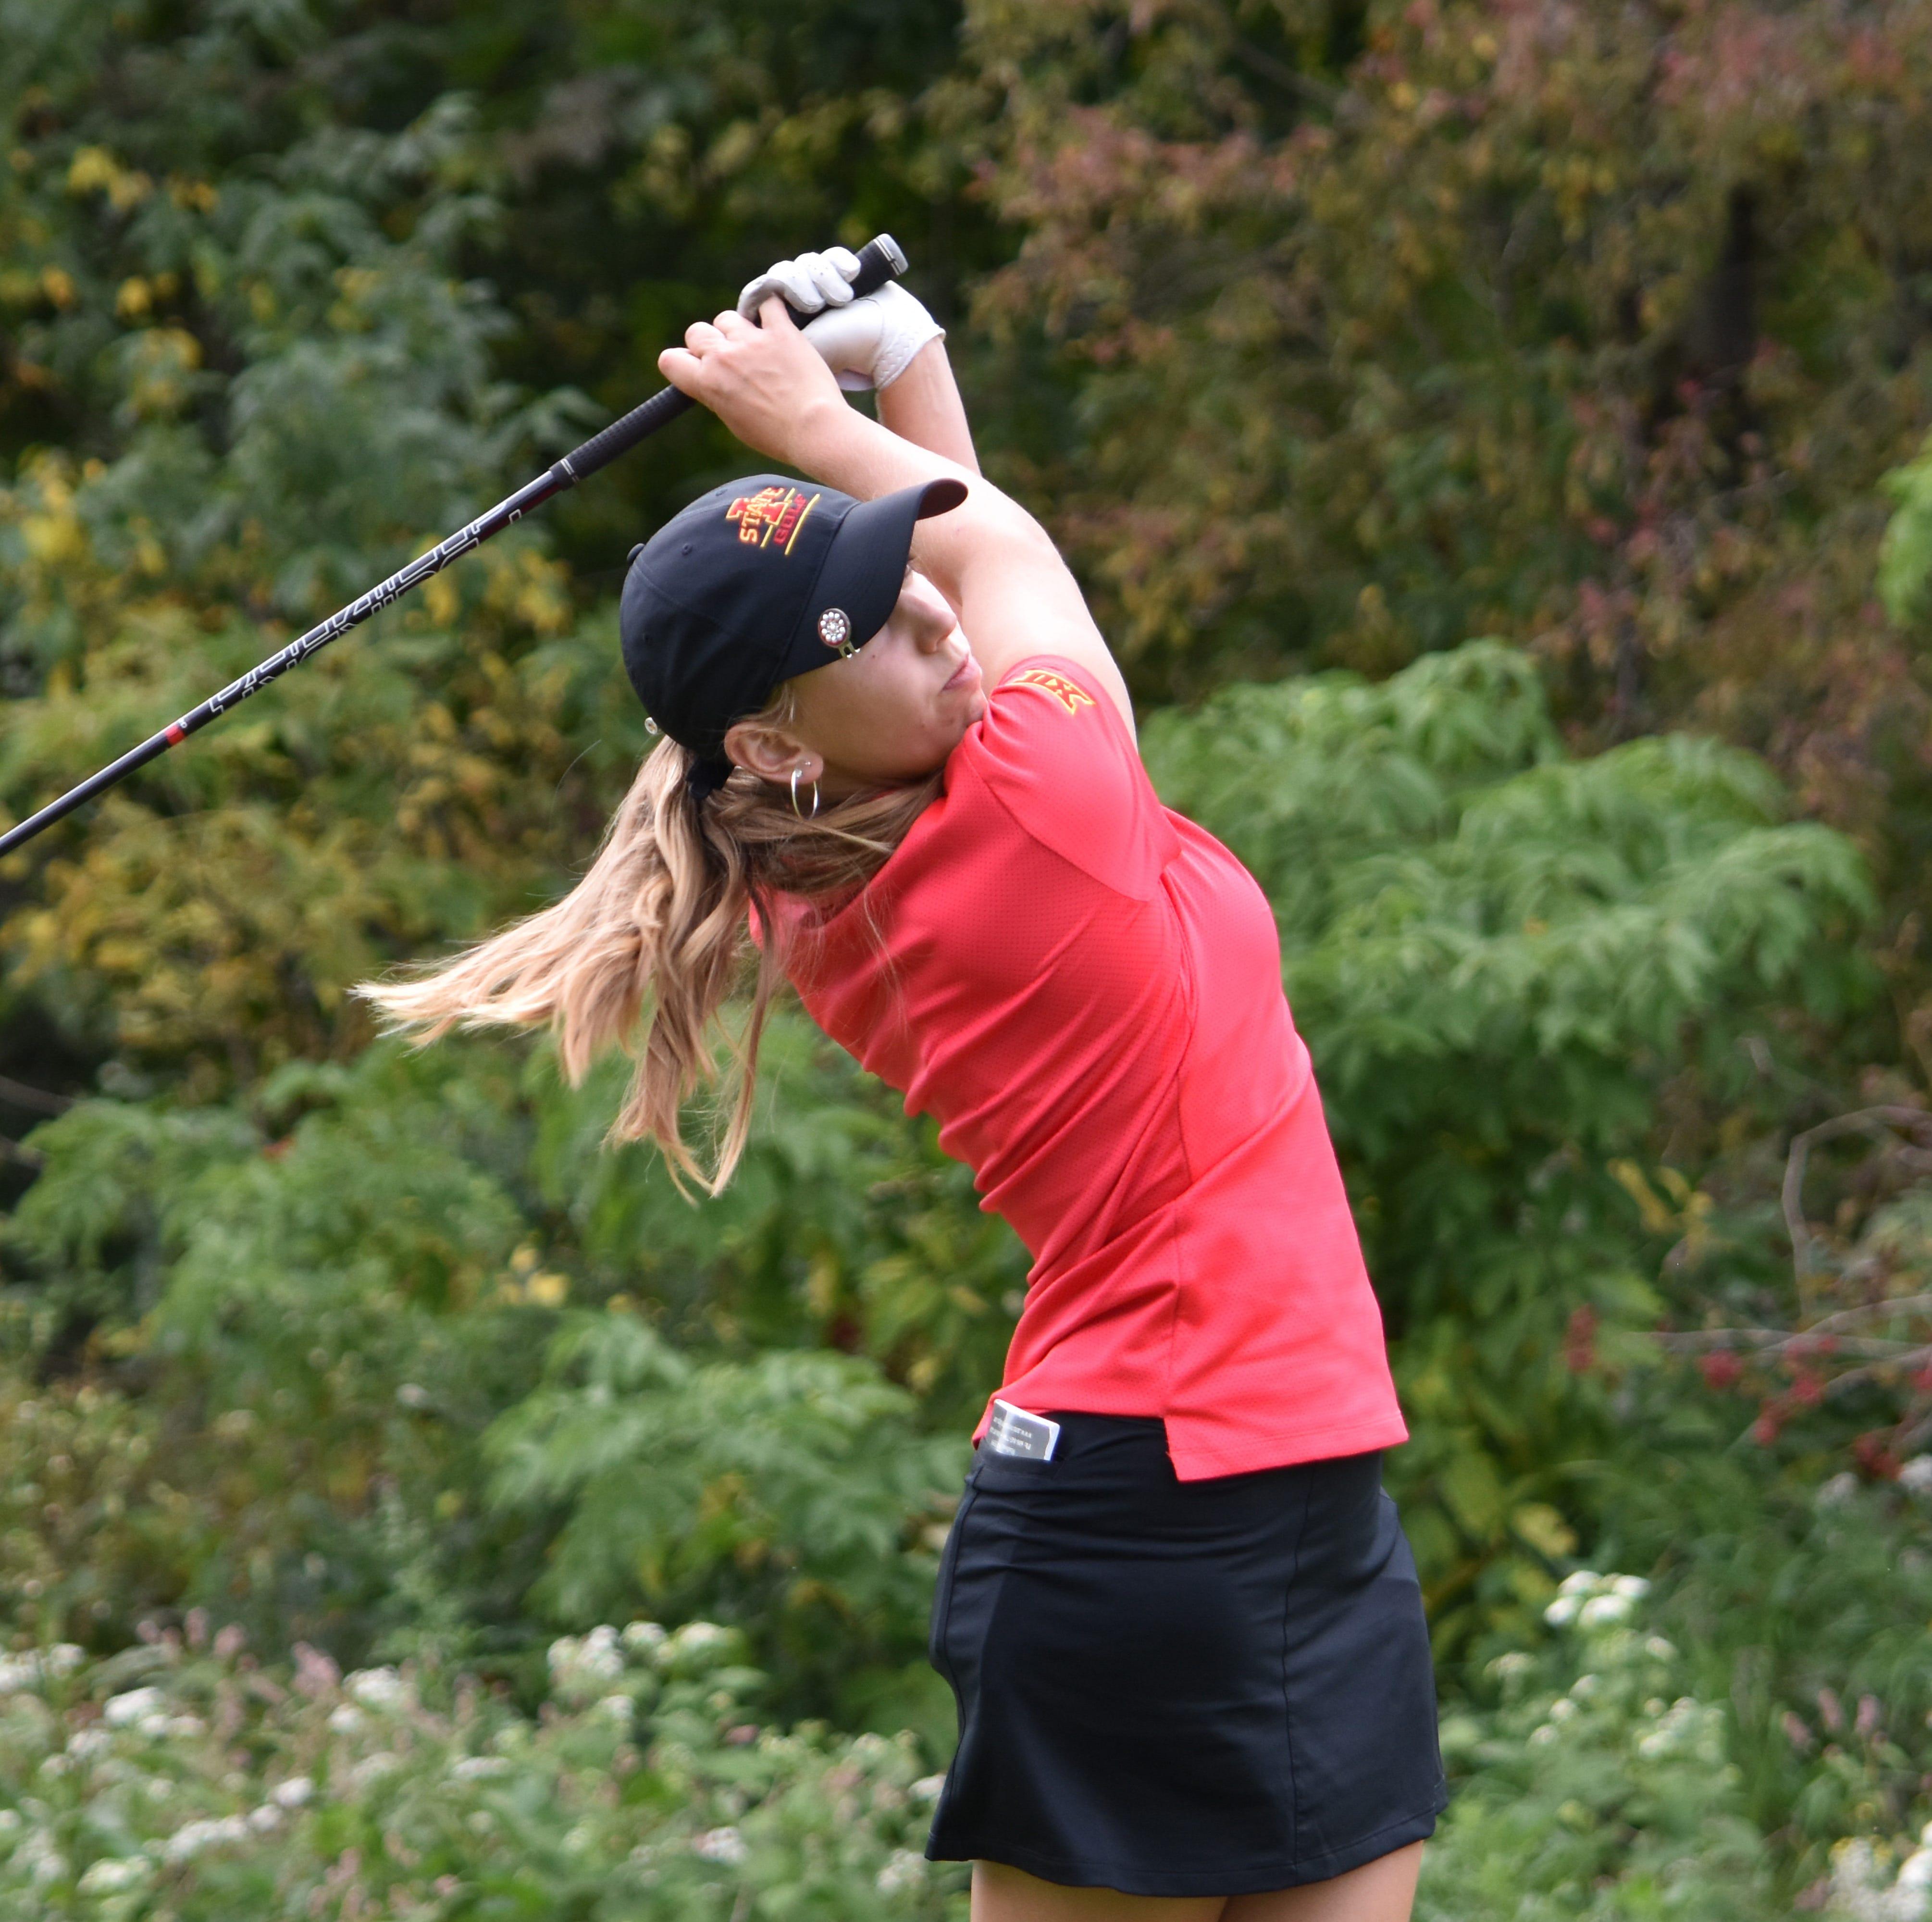 Ladies European Tour honors Celia Barquin Arozamena at golf tournament in her native Spain